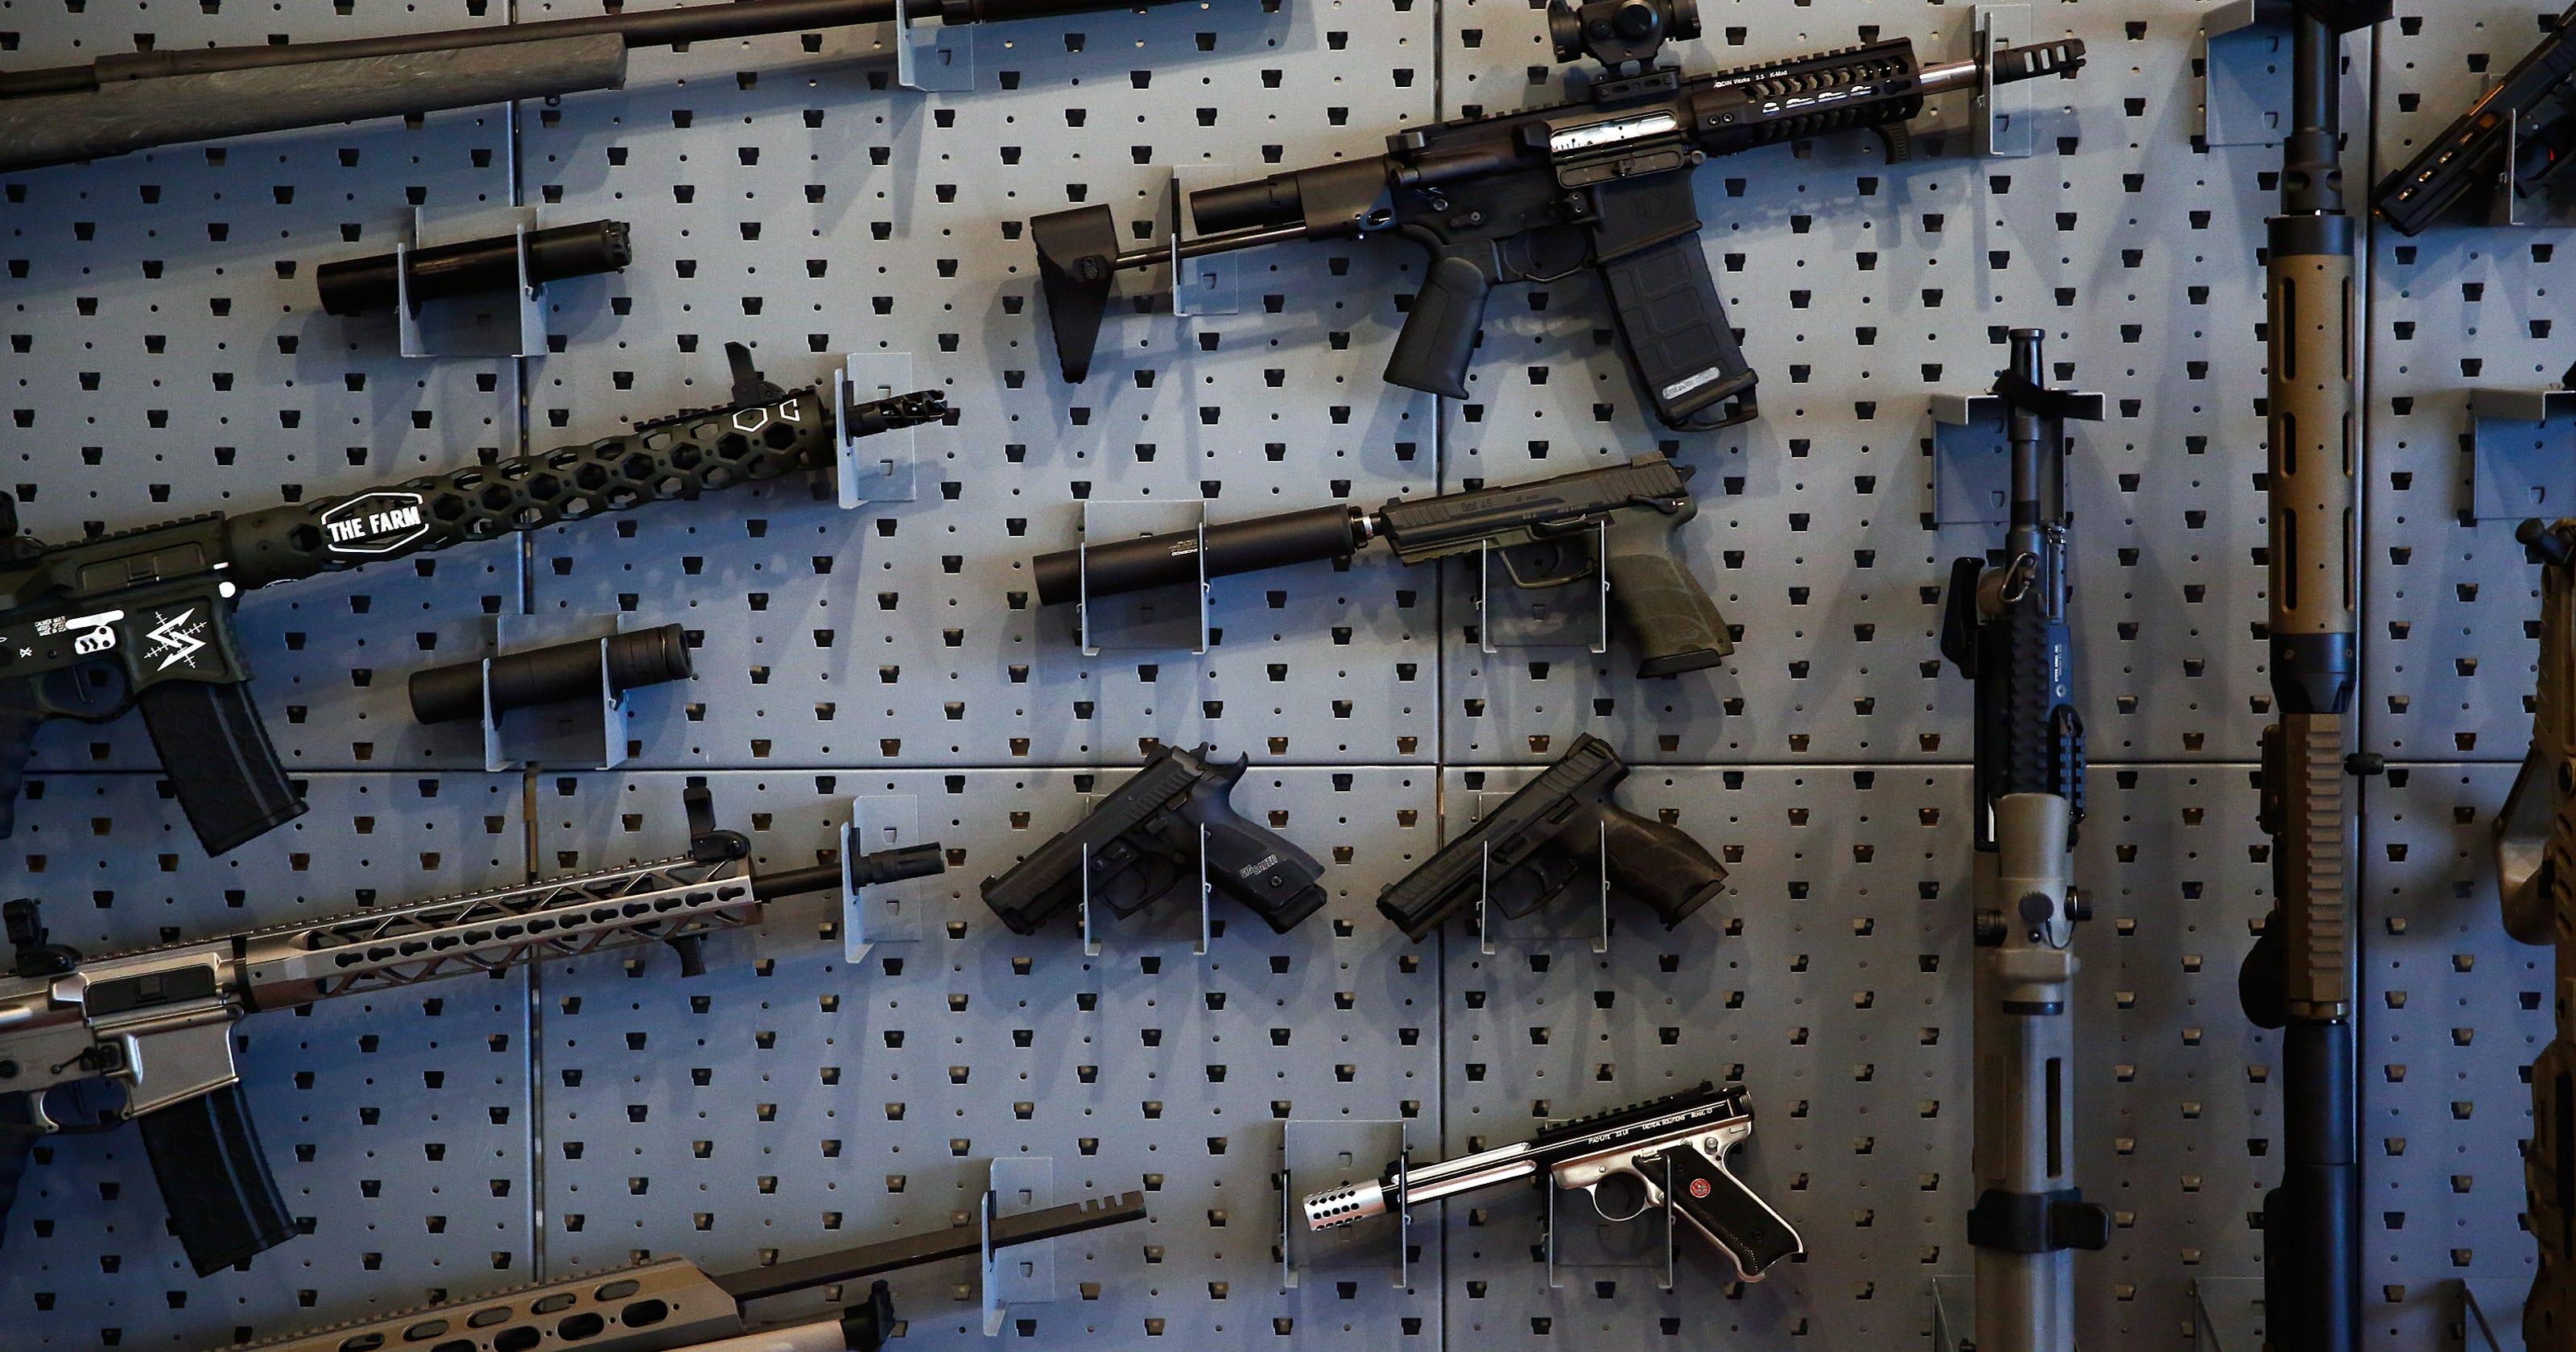 background checks for gun sales spiked as fl legislators debated bill